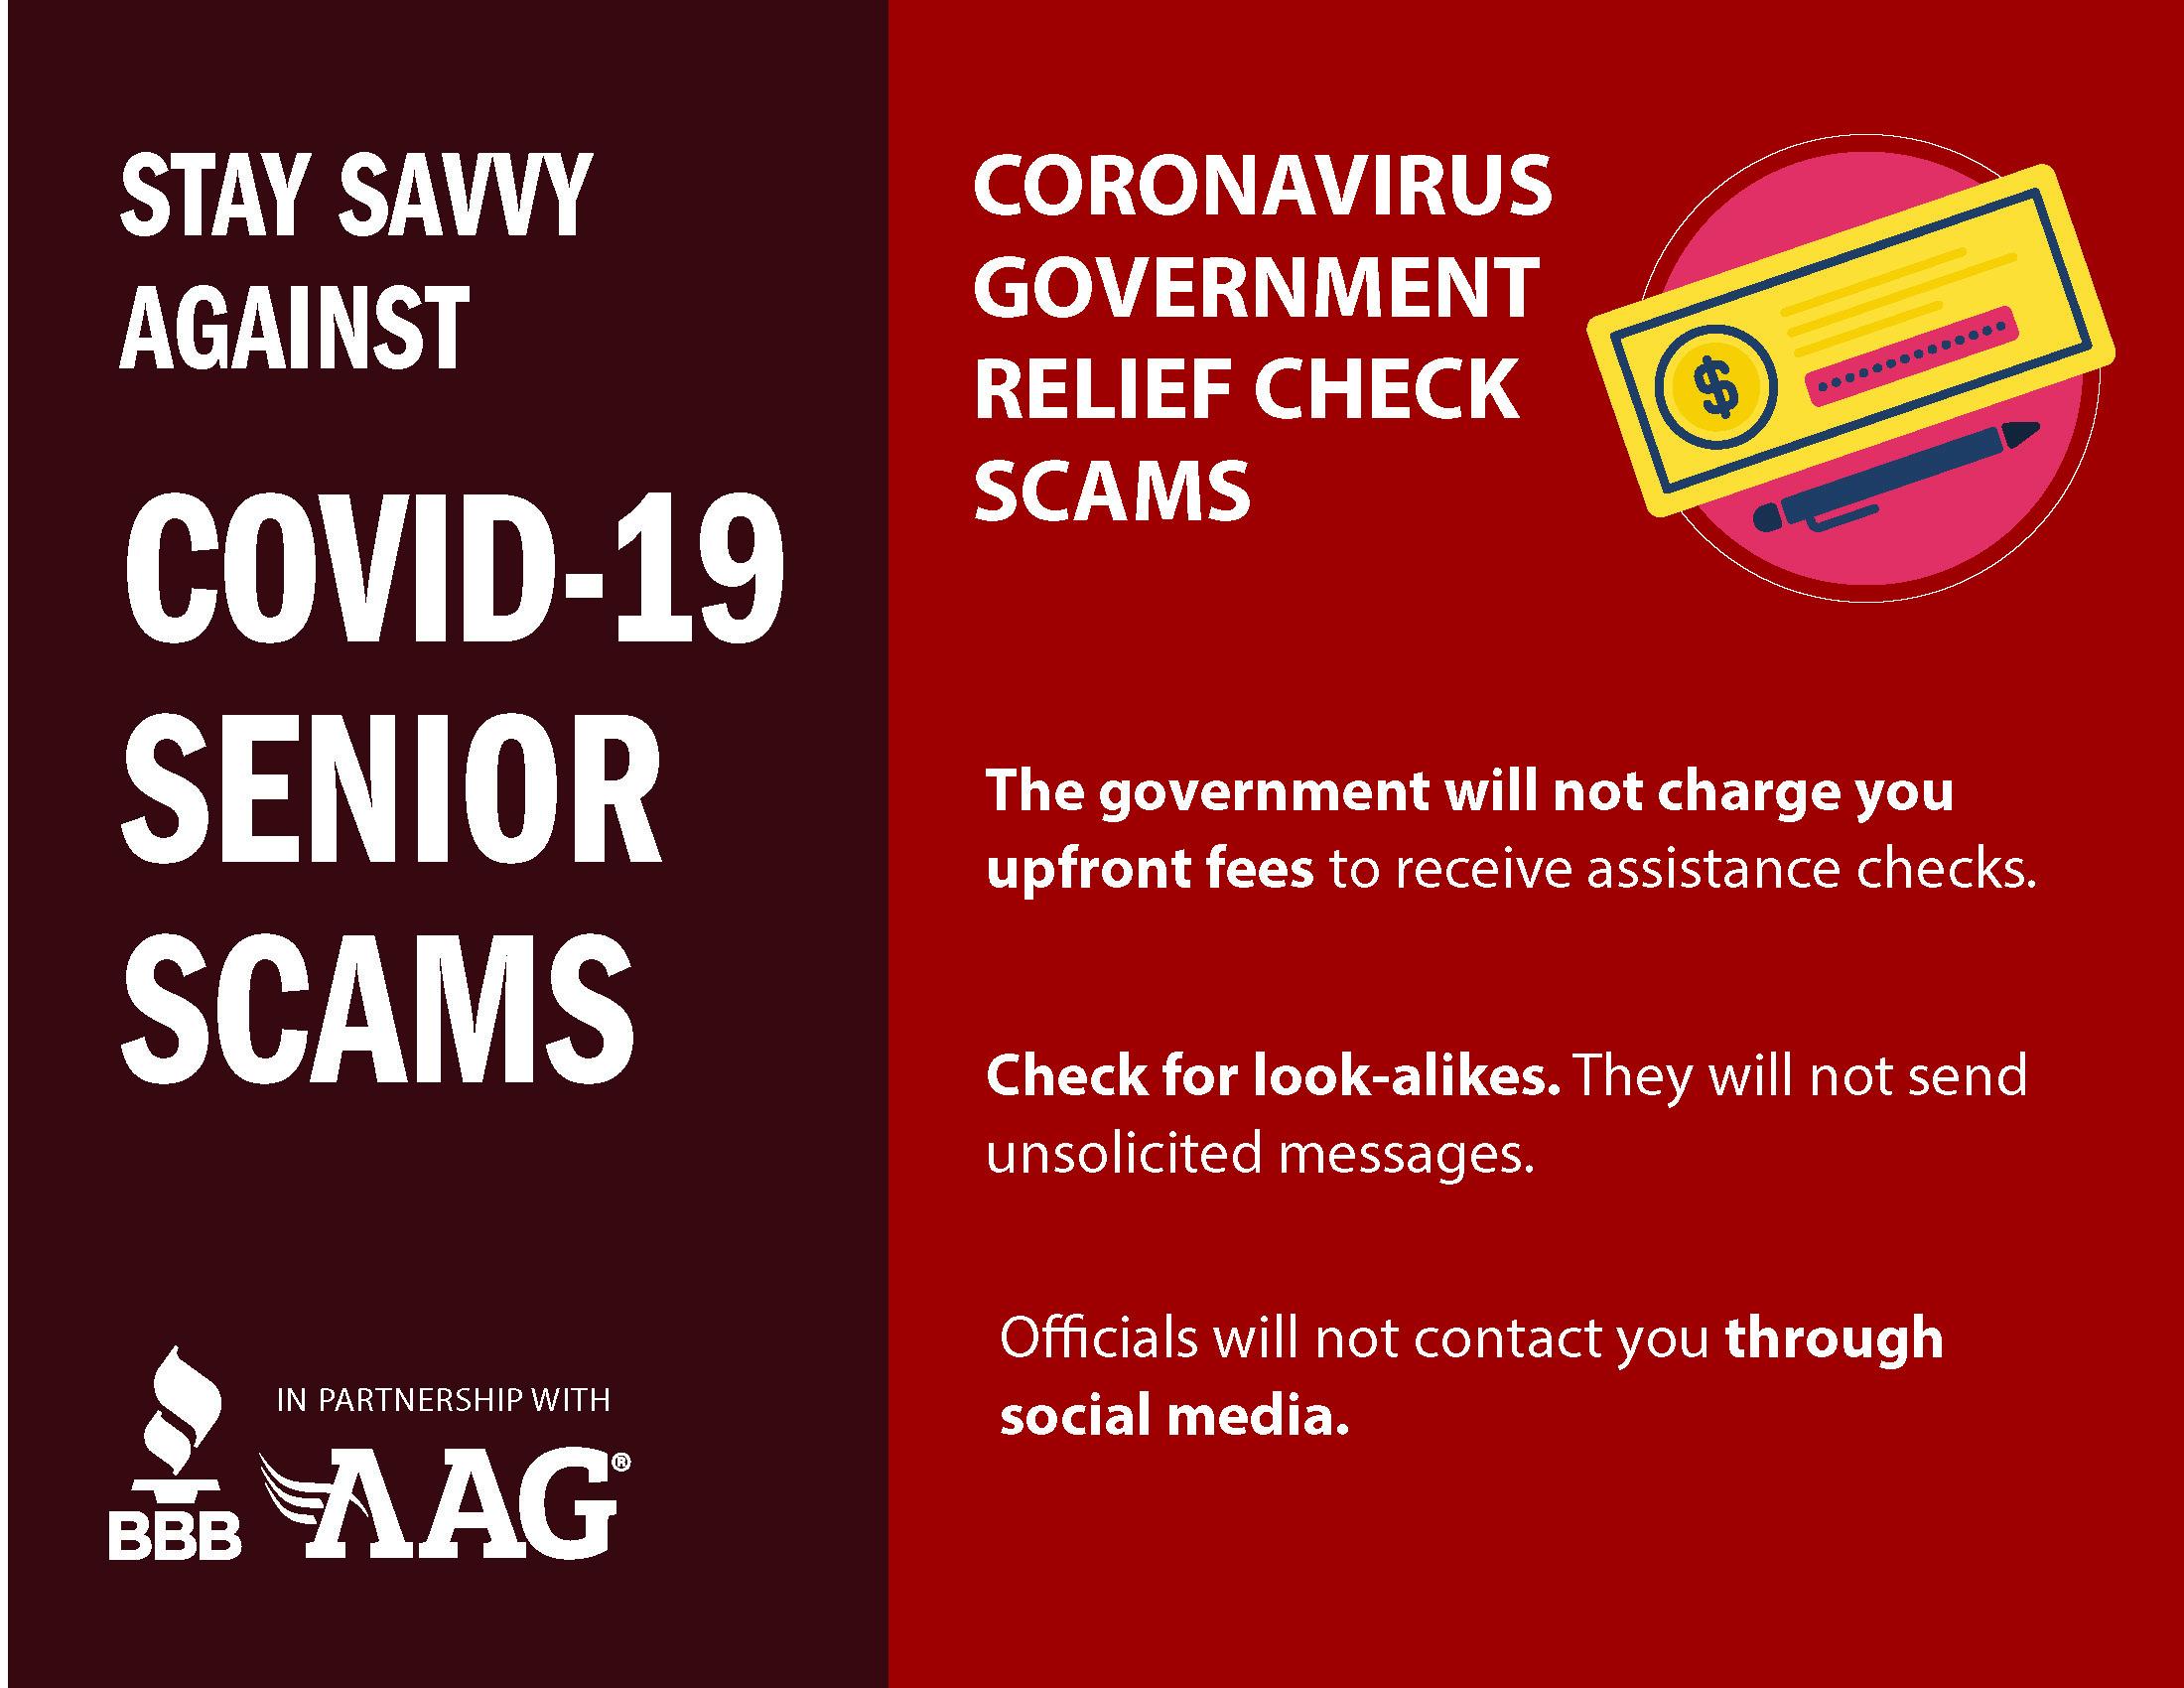 Coronavirus Government Relief Check Scams